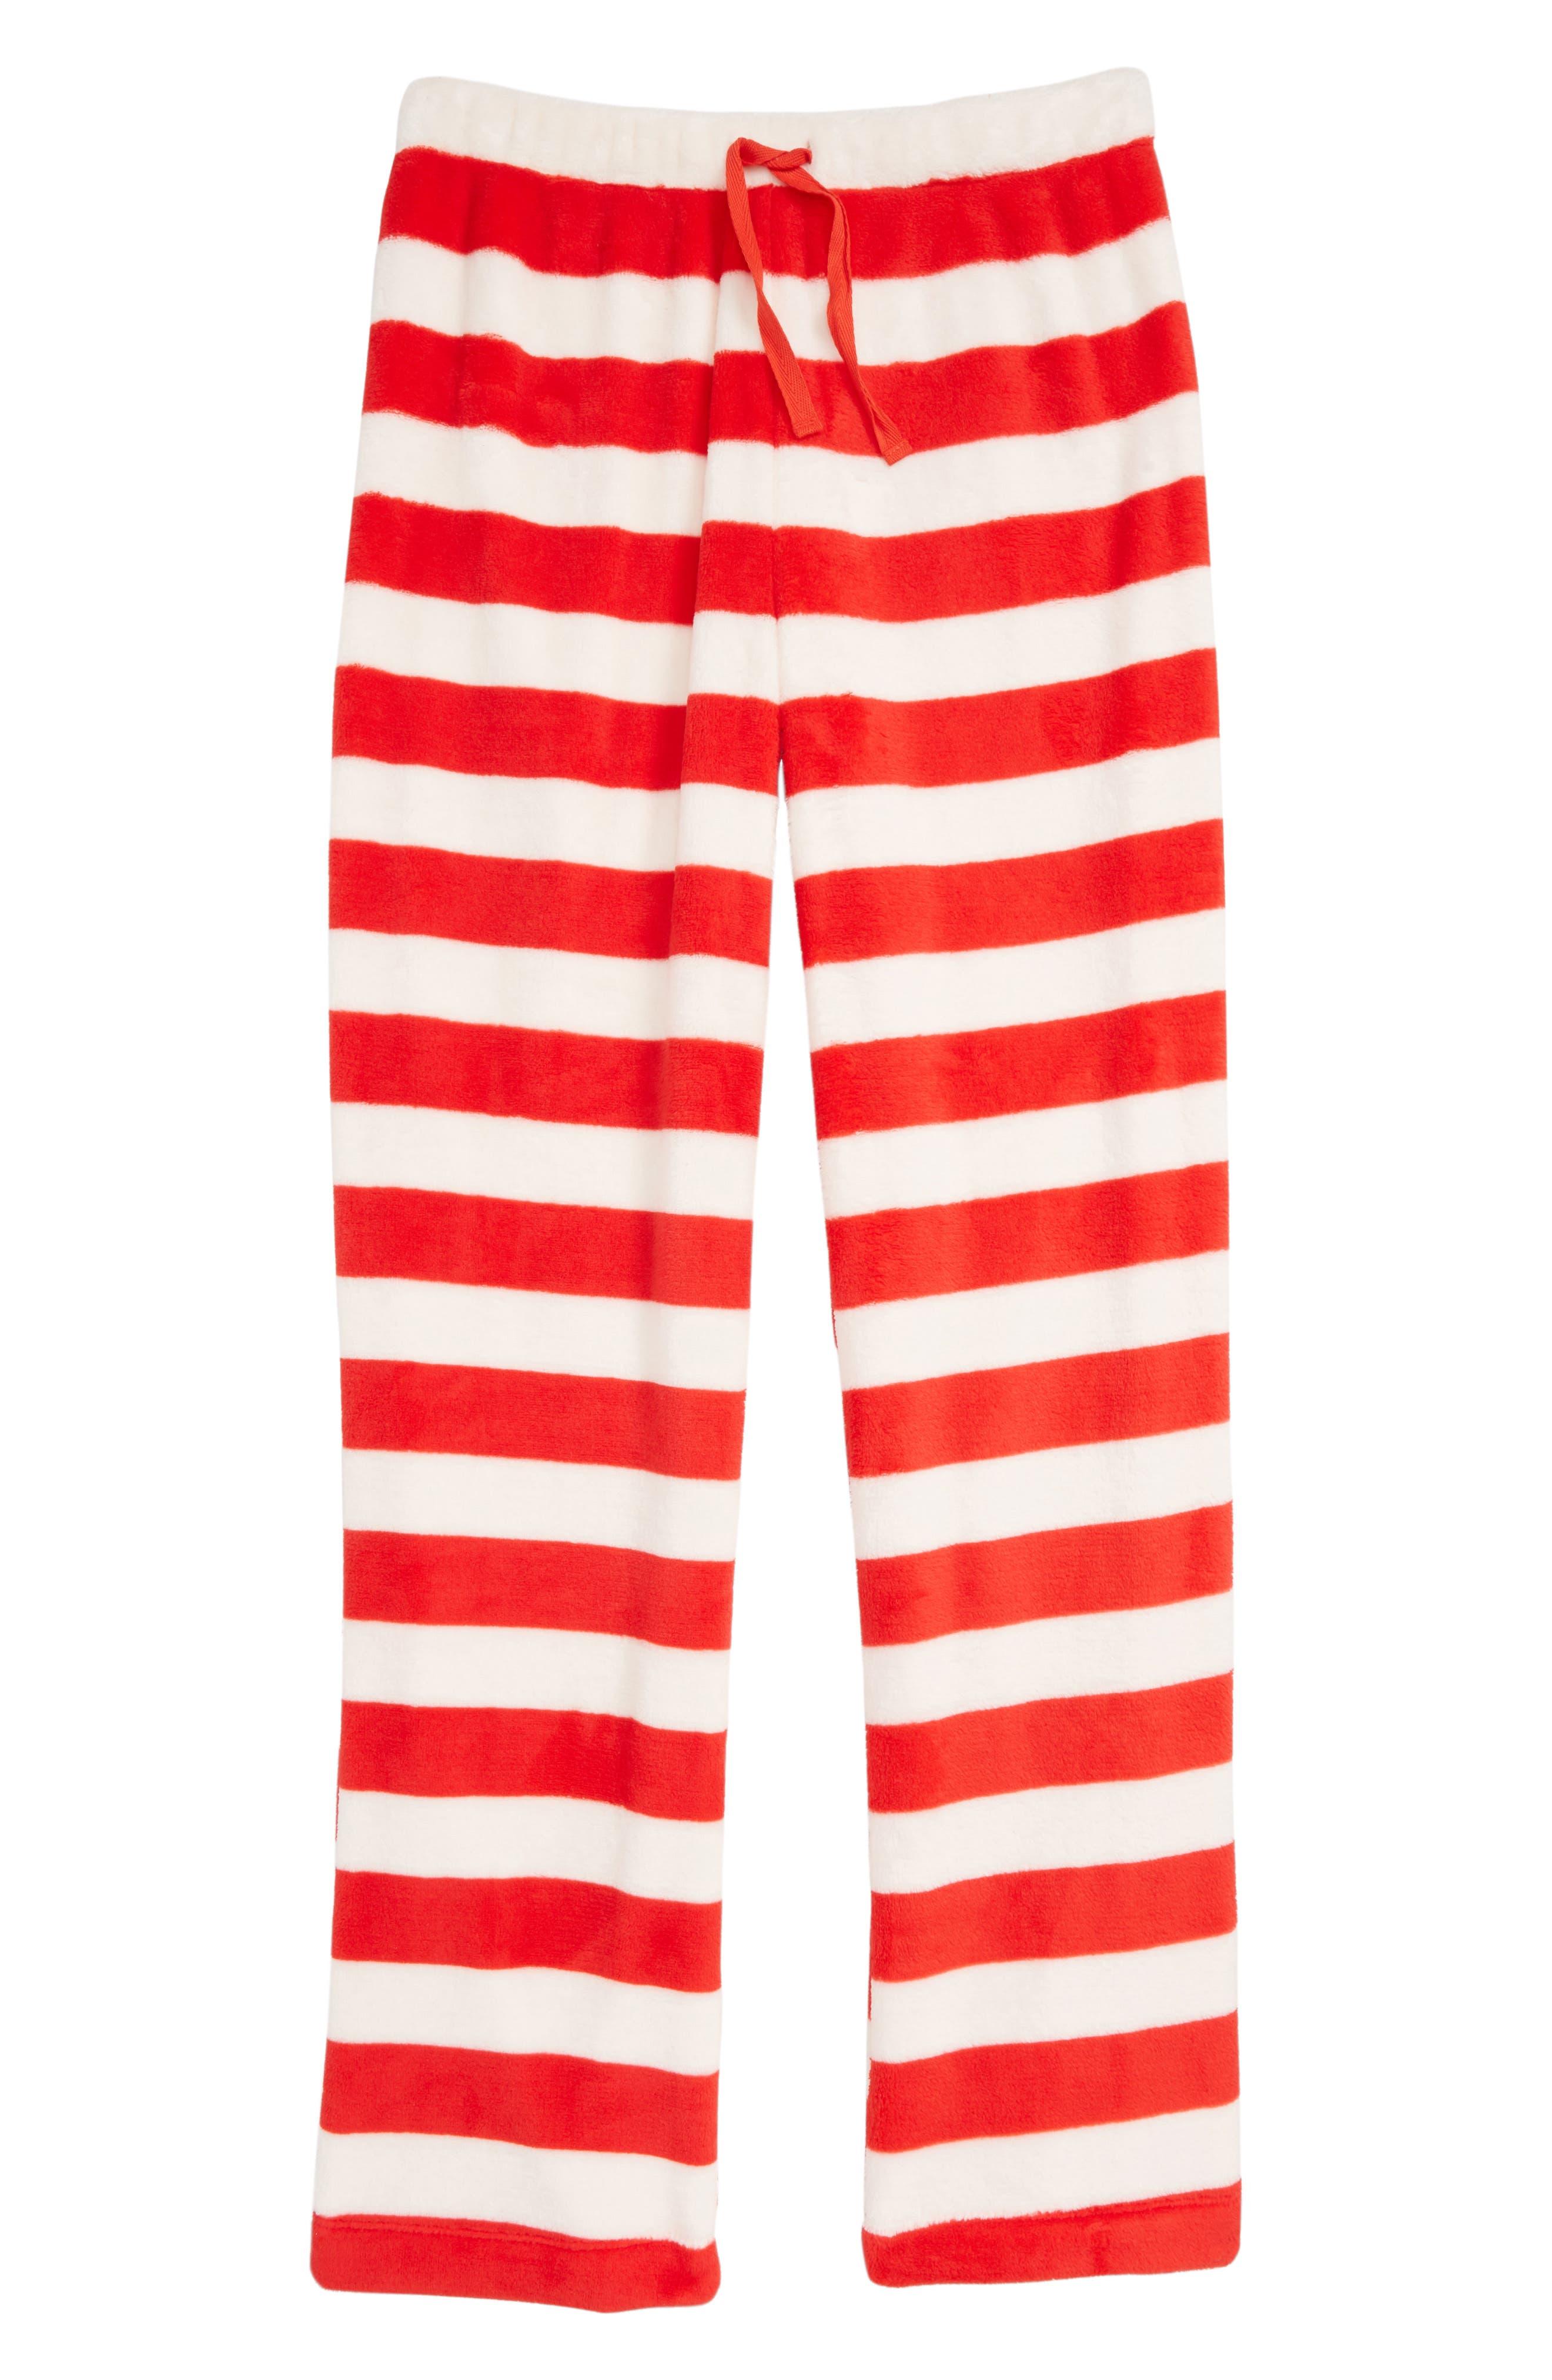 Fleece Pajama Pants,                             Main thumbnail 1, color,                             RED BLOOM- IVORY STRIPE